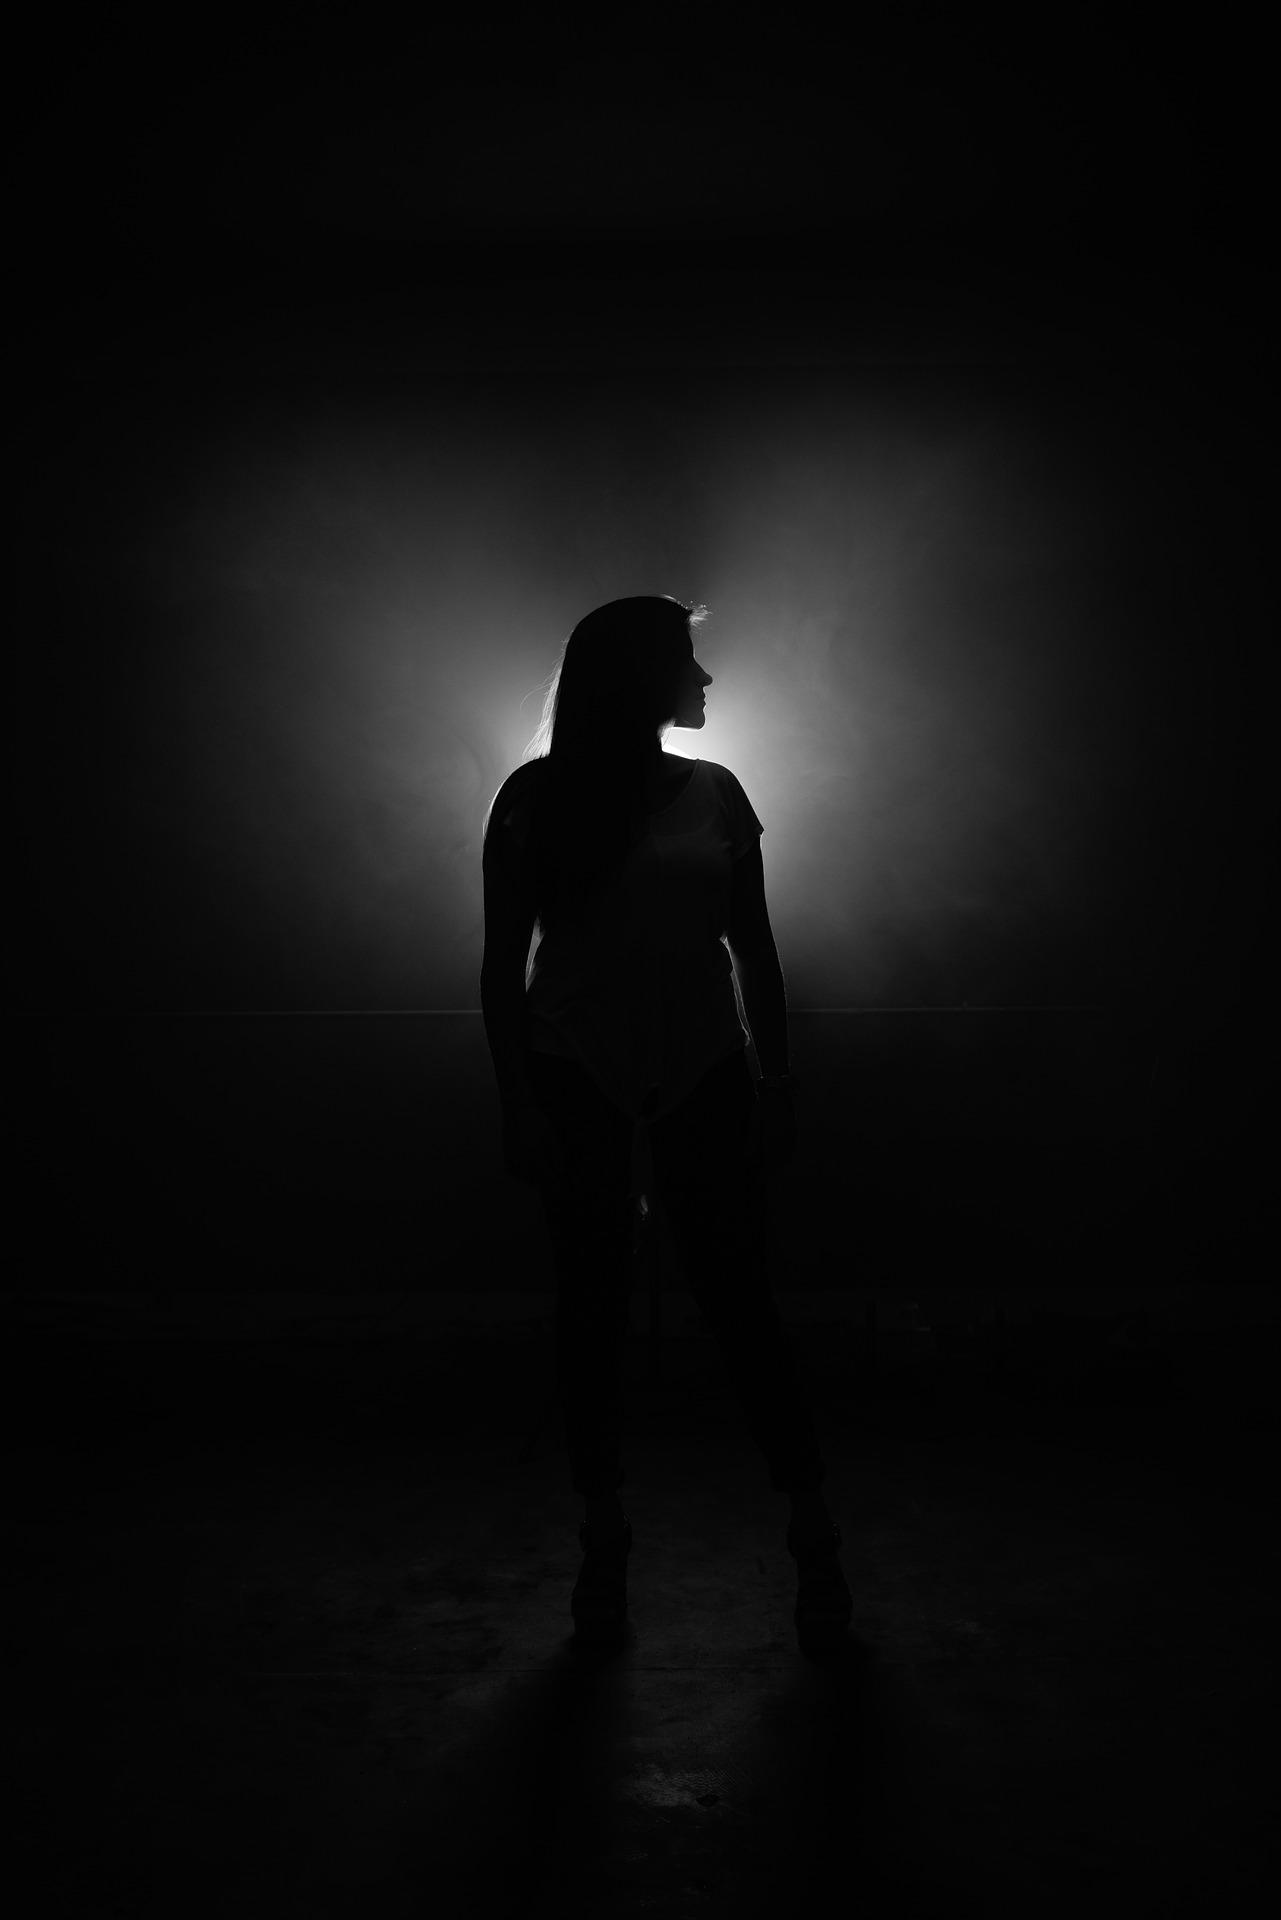 dark-2565251_1920.jpg